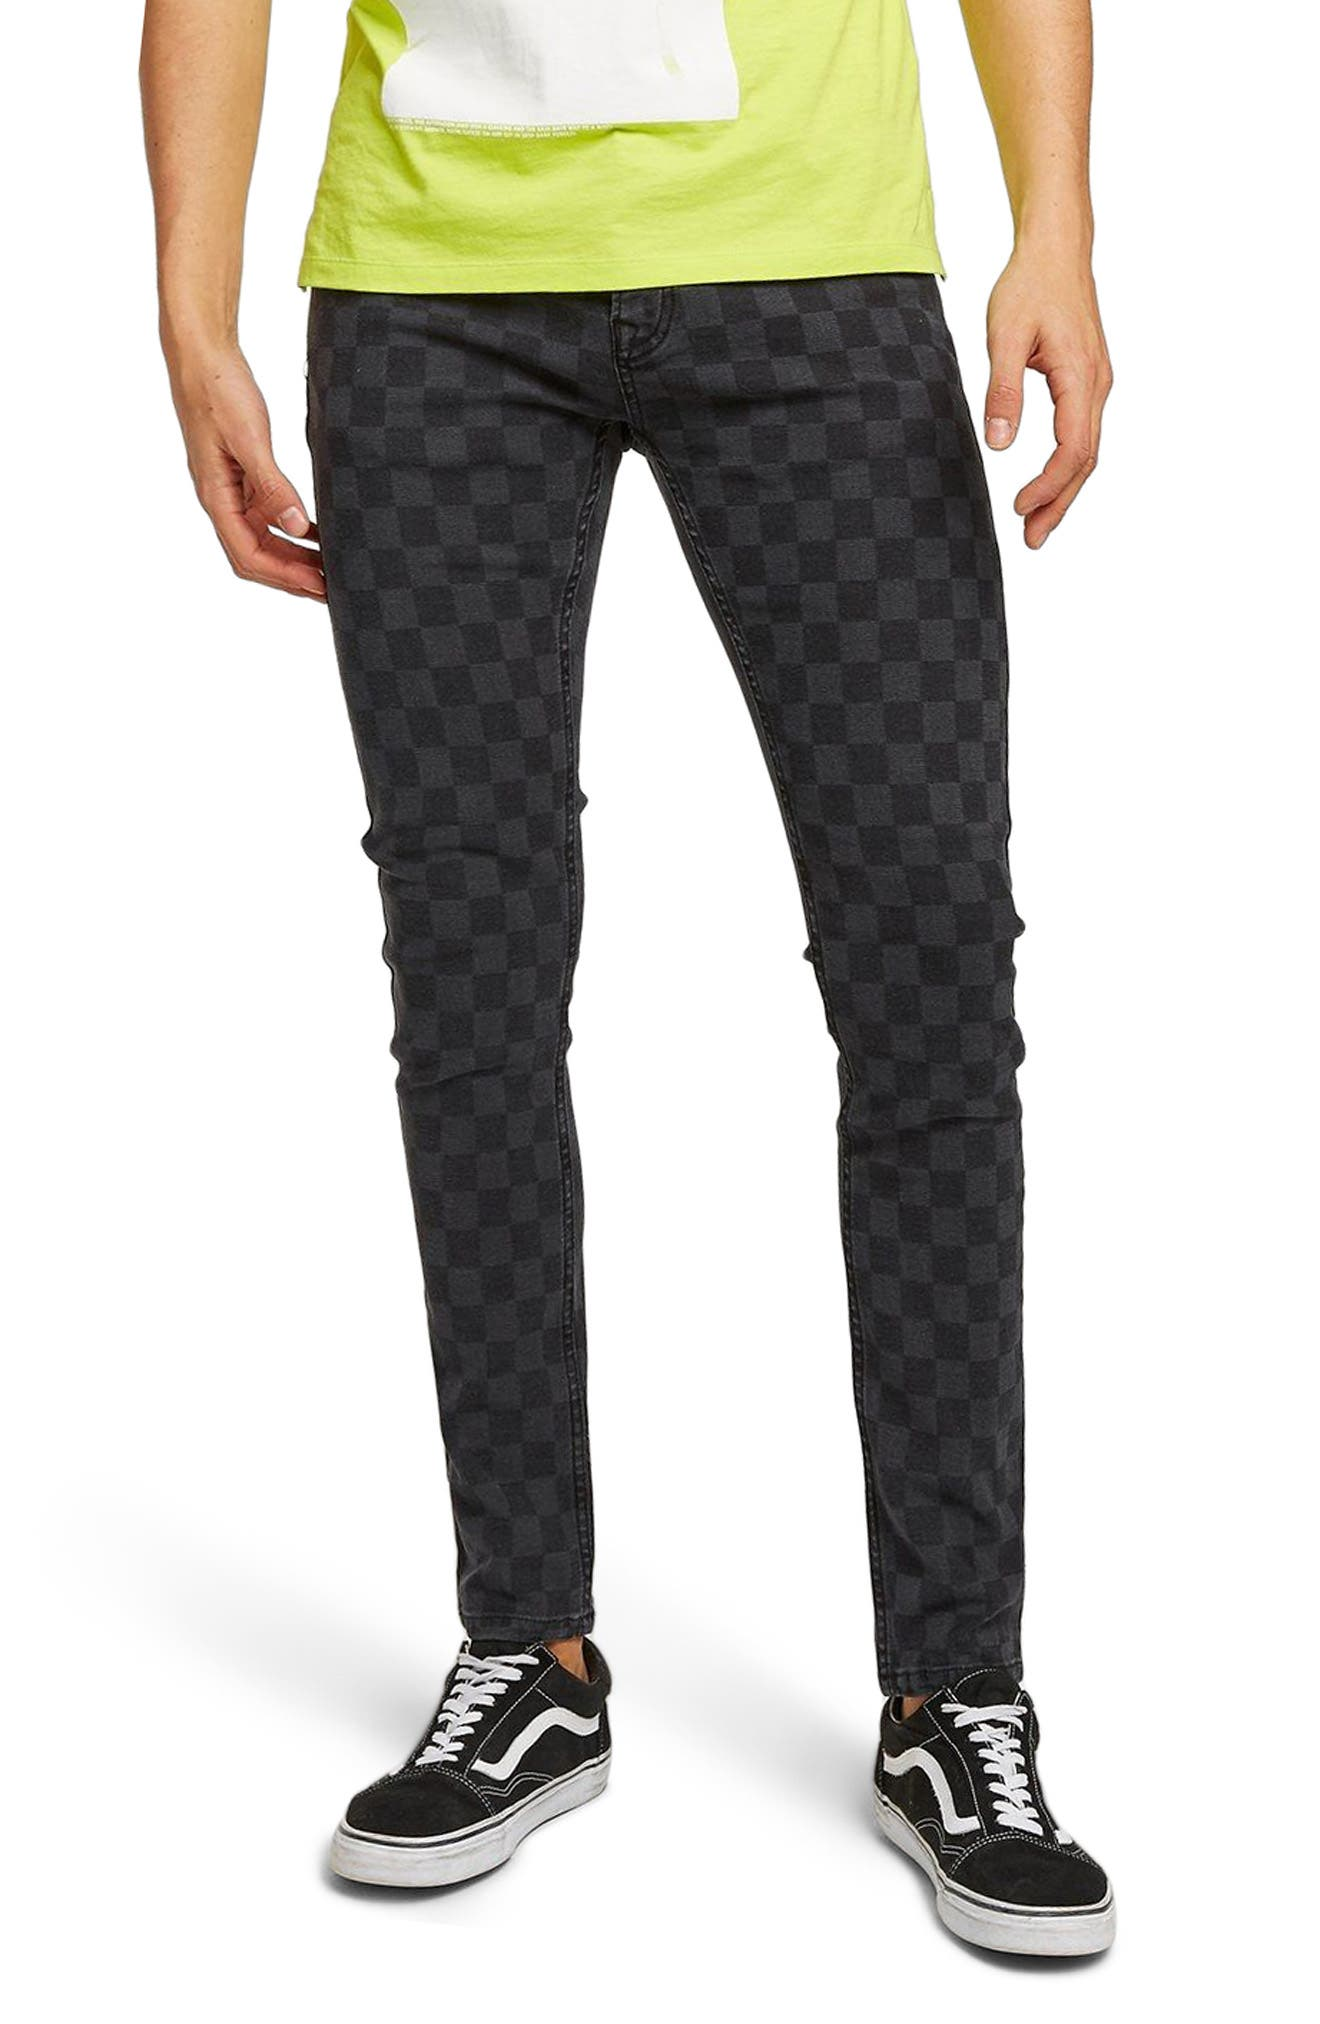 Check Stretch Skinny Fit Pants,                         Main,                         color, Black Multi